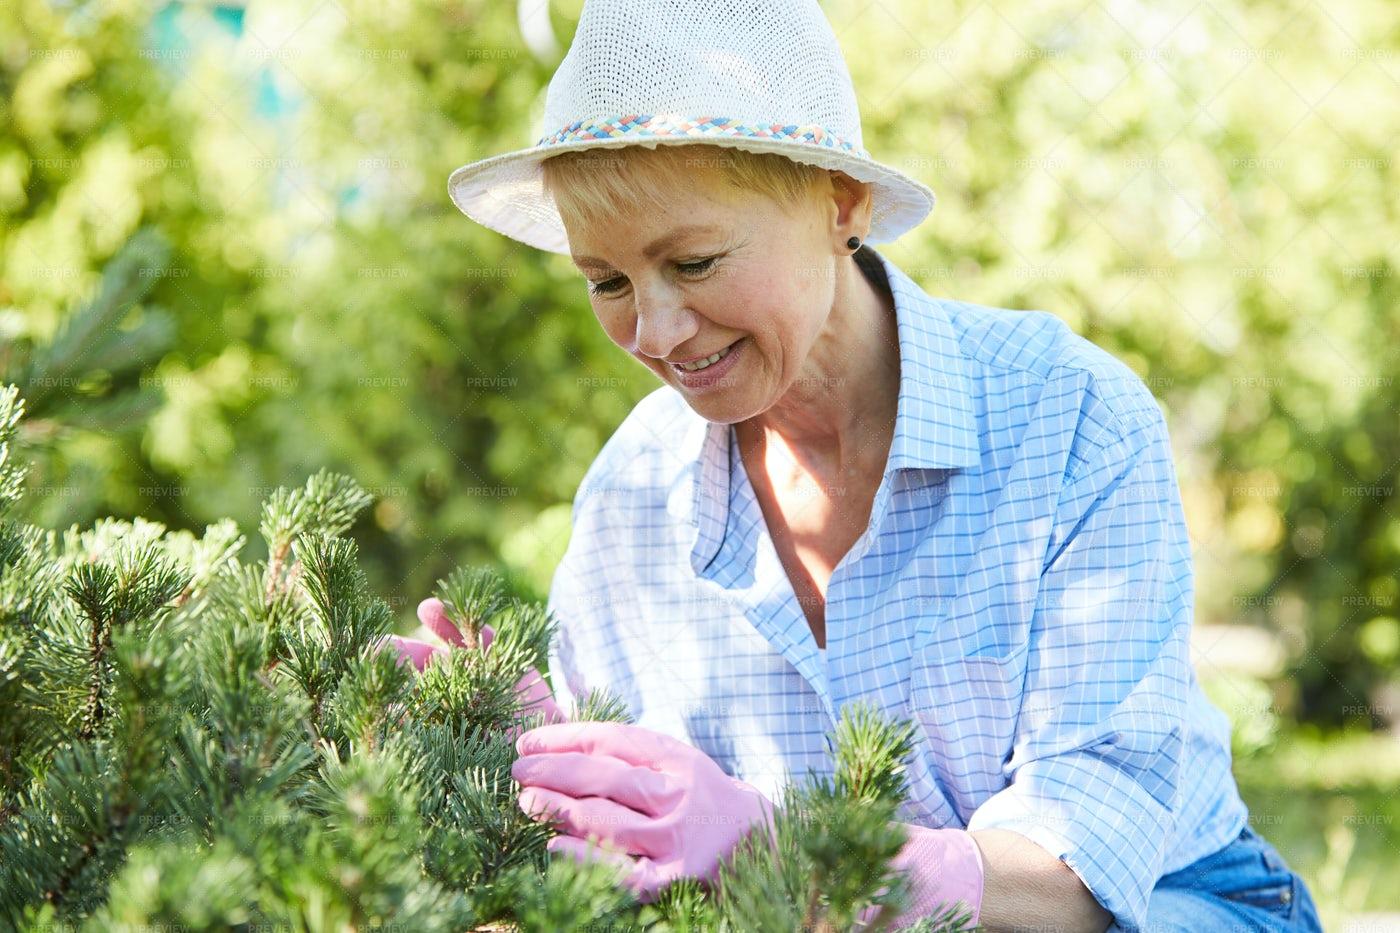 Smiling Senior Woman Gardening: Stock Photos